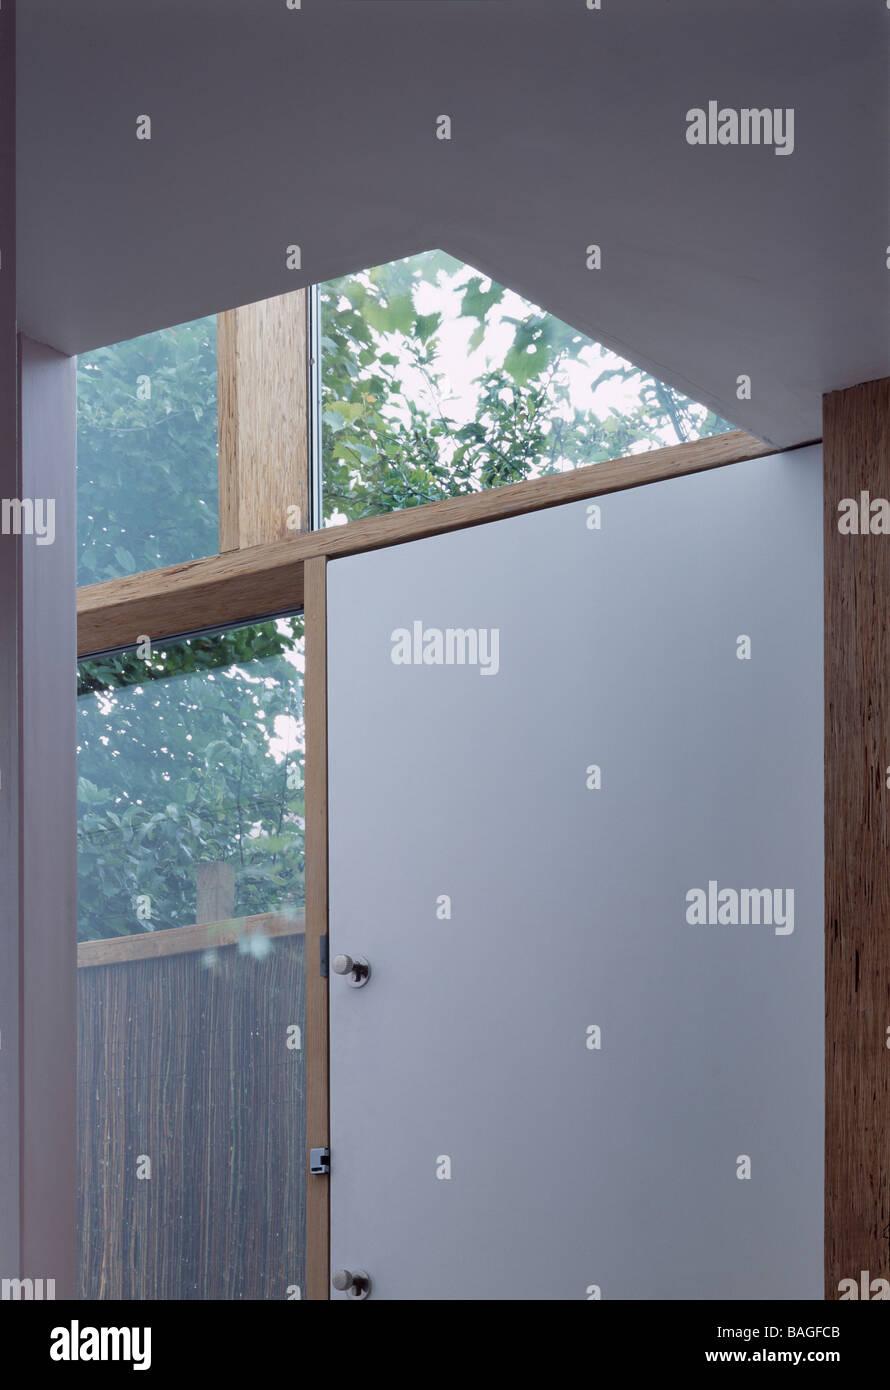 In-Between, London, United Kingdom, Annalie Riches Silvia Ullmayer and Barti Garibaldo, In-between window and door - Stock Image